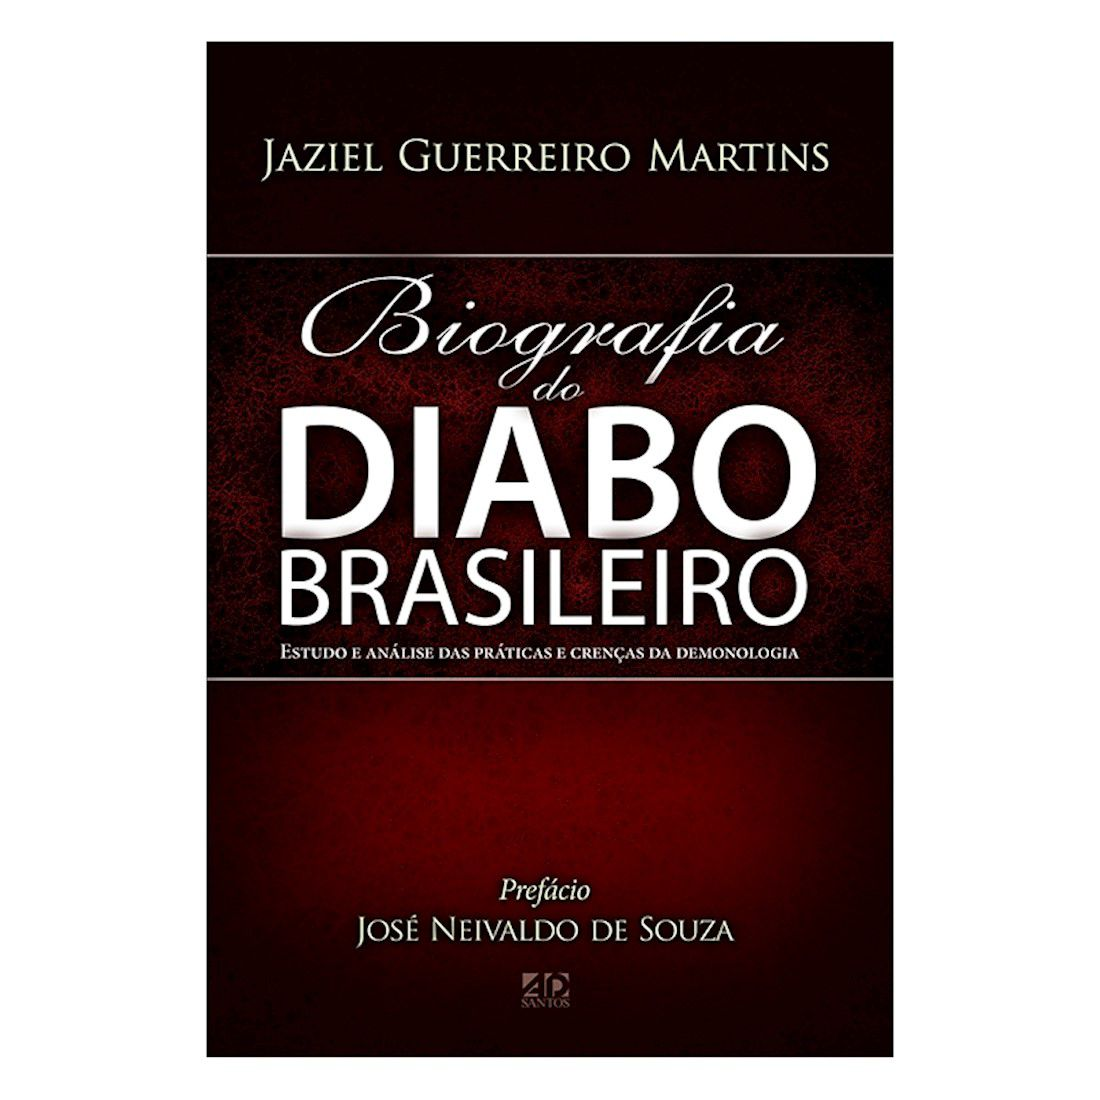 Livro Biografia do Diabo Brasileiro